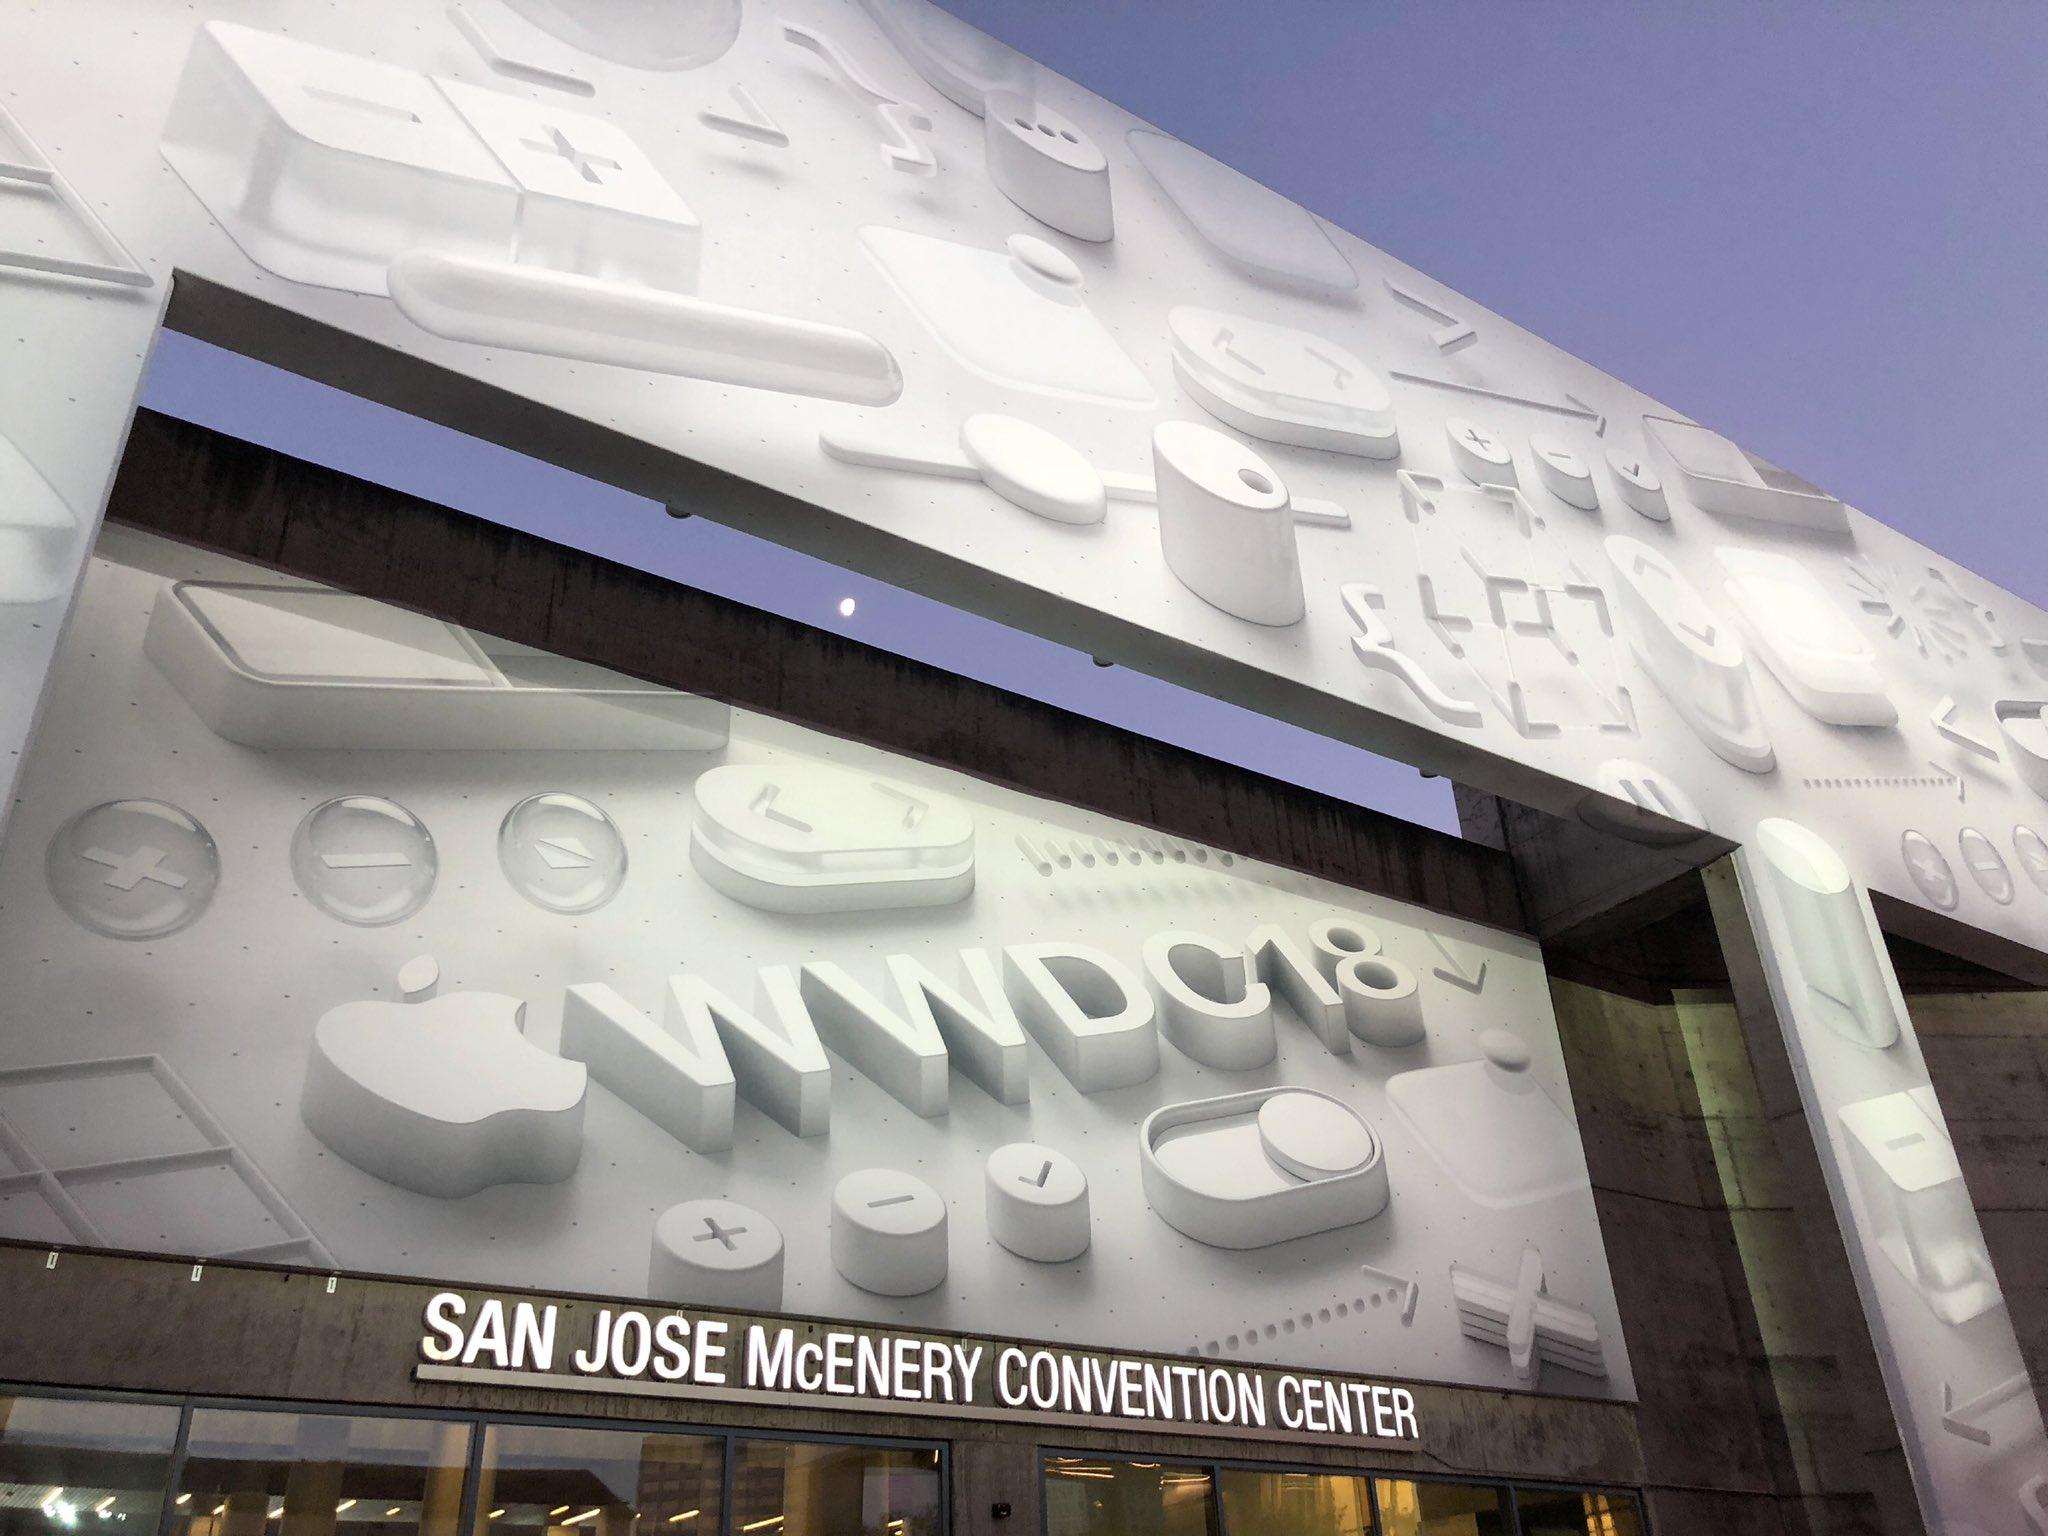 McEnery Convention Center listo para la WWDC 2018